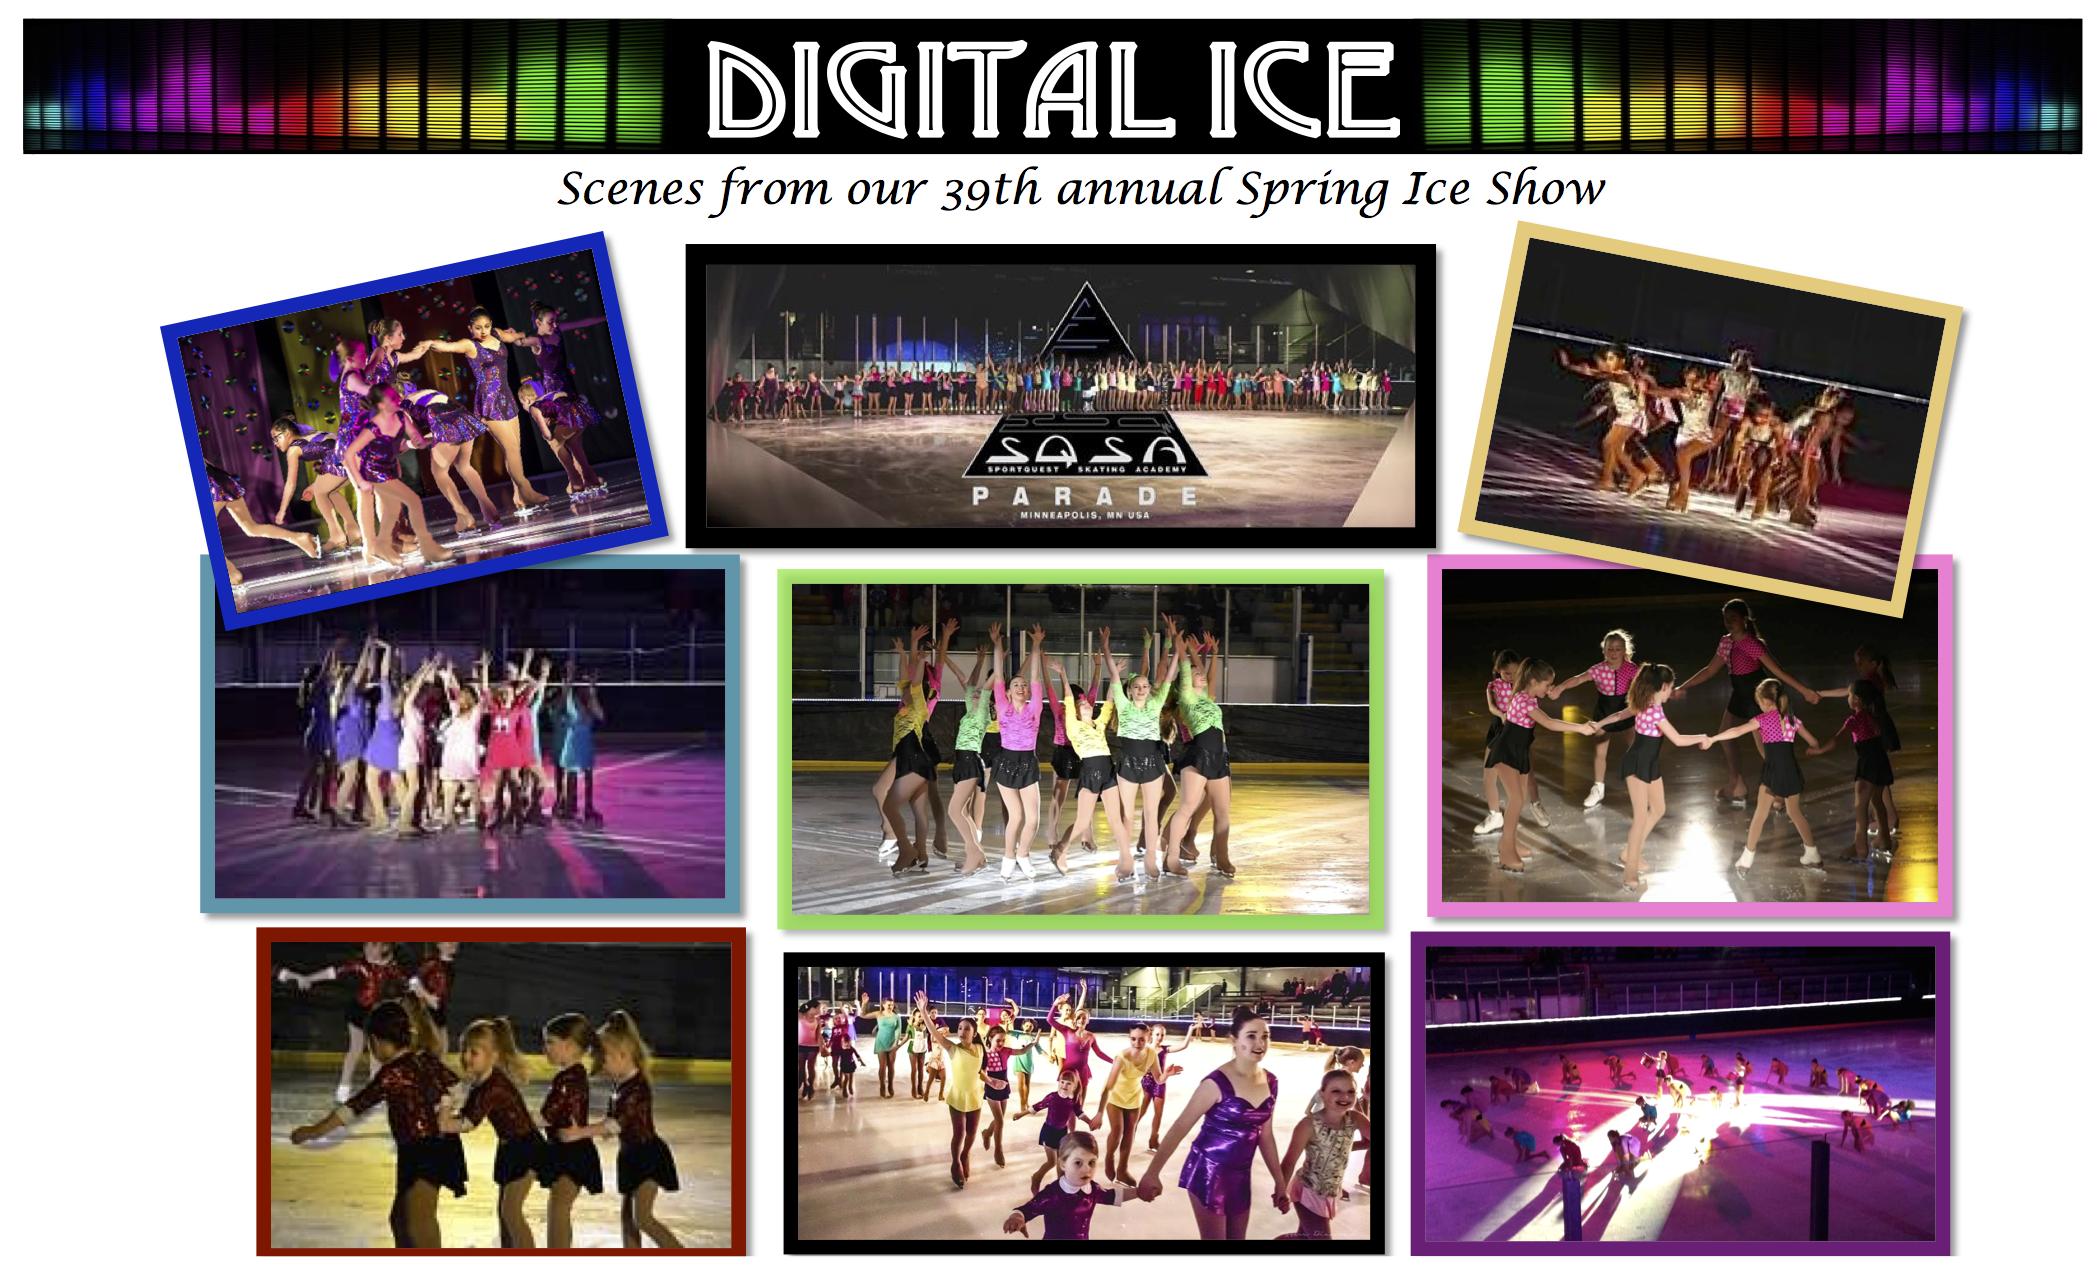 Scenes from Digital Ice